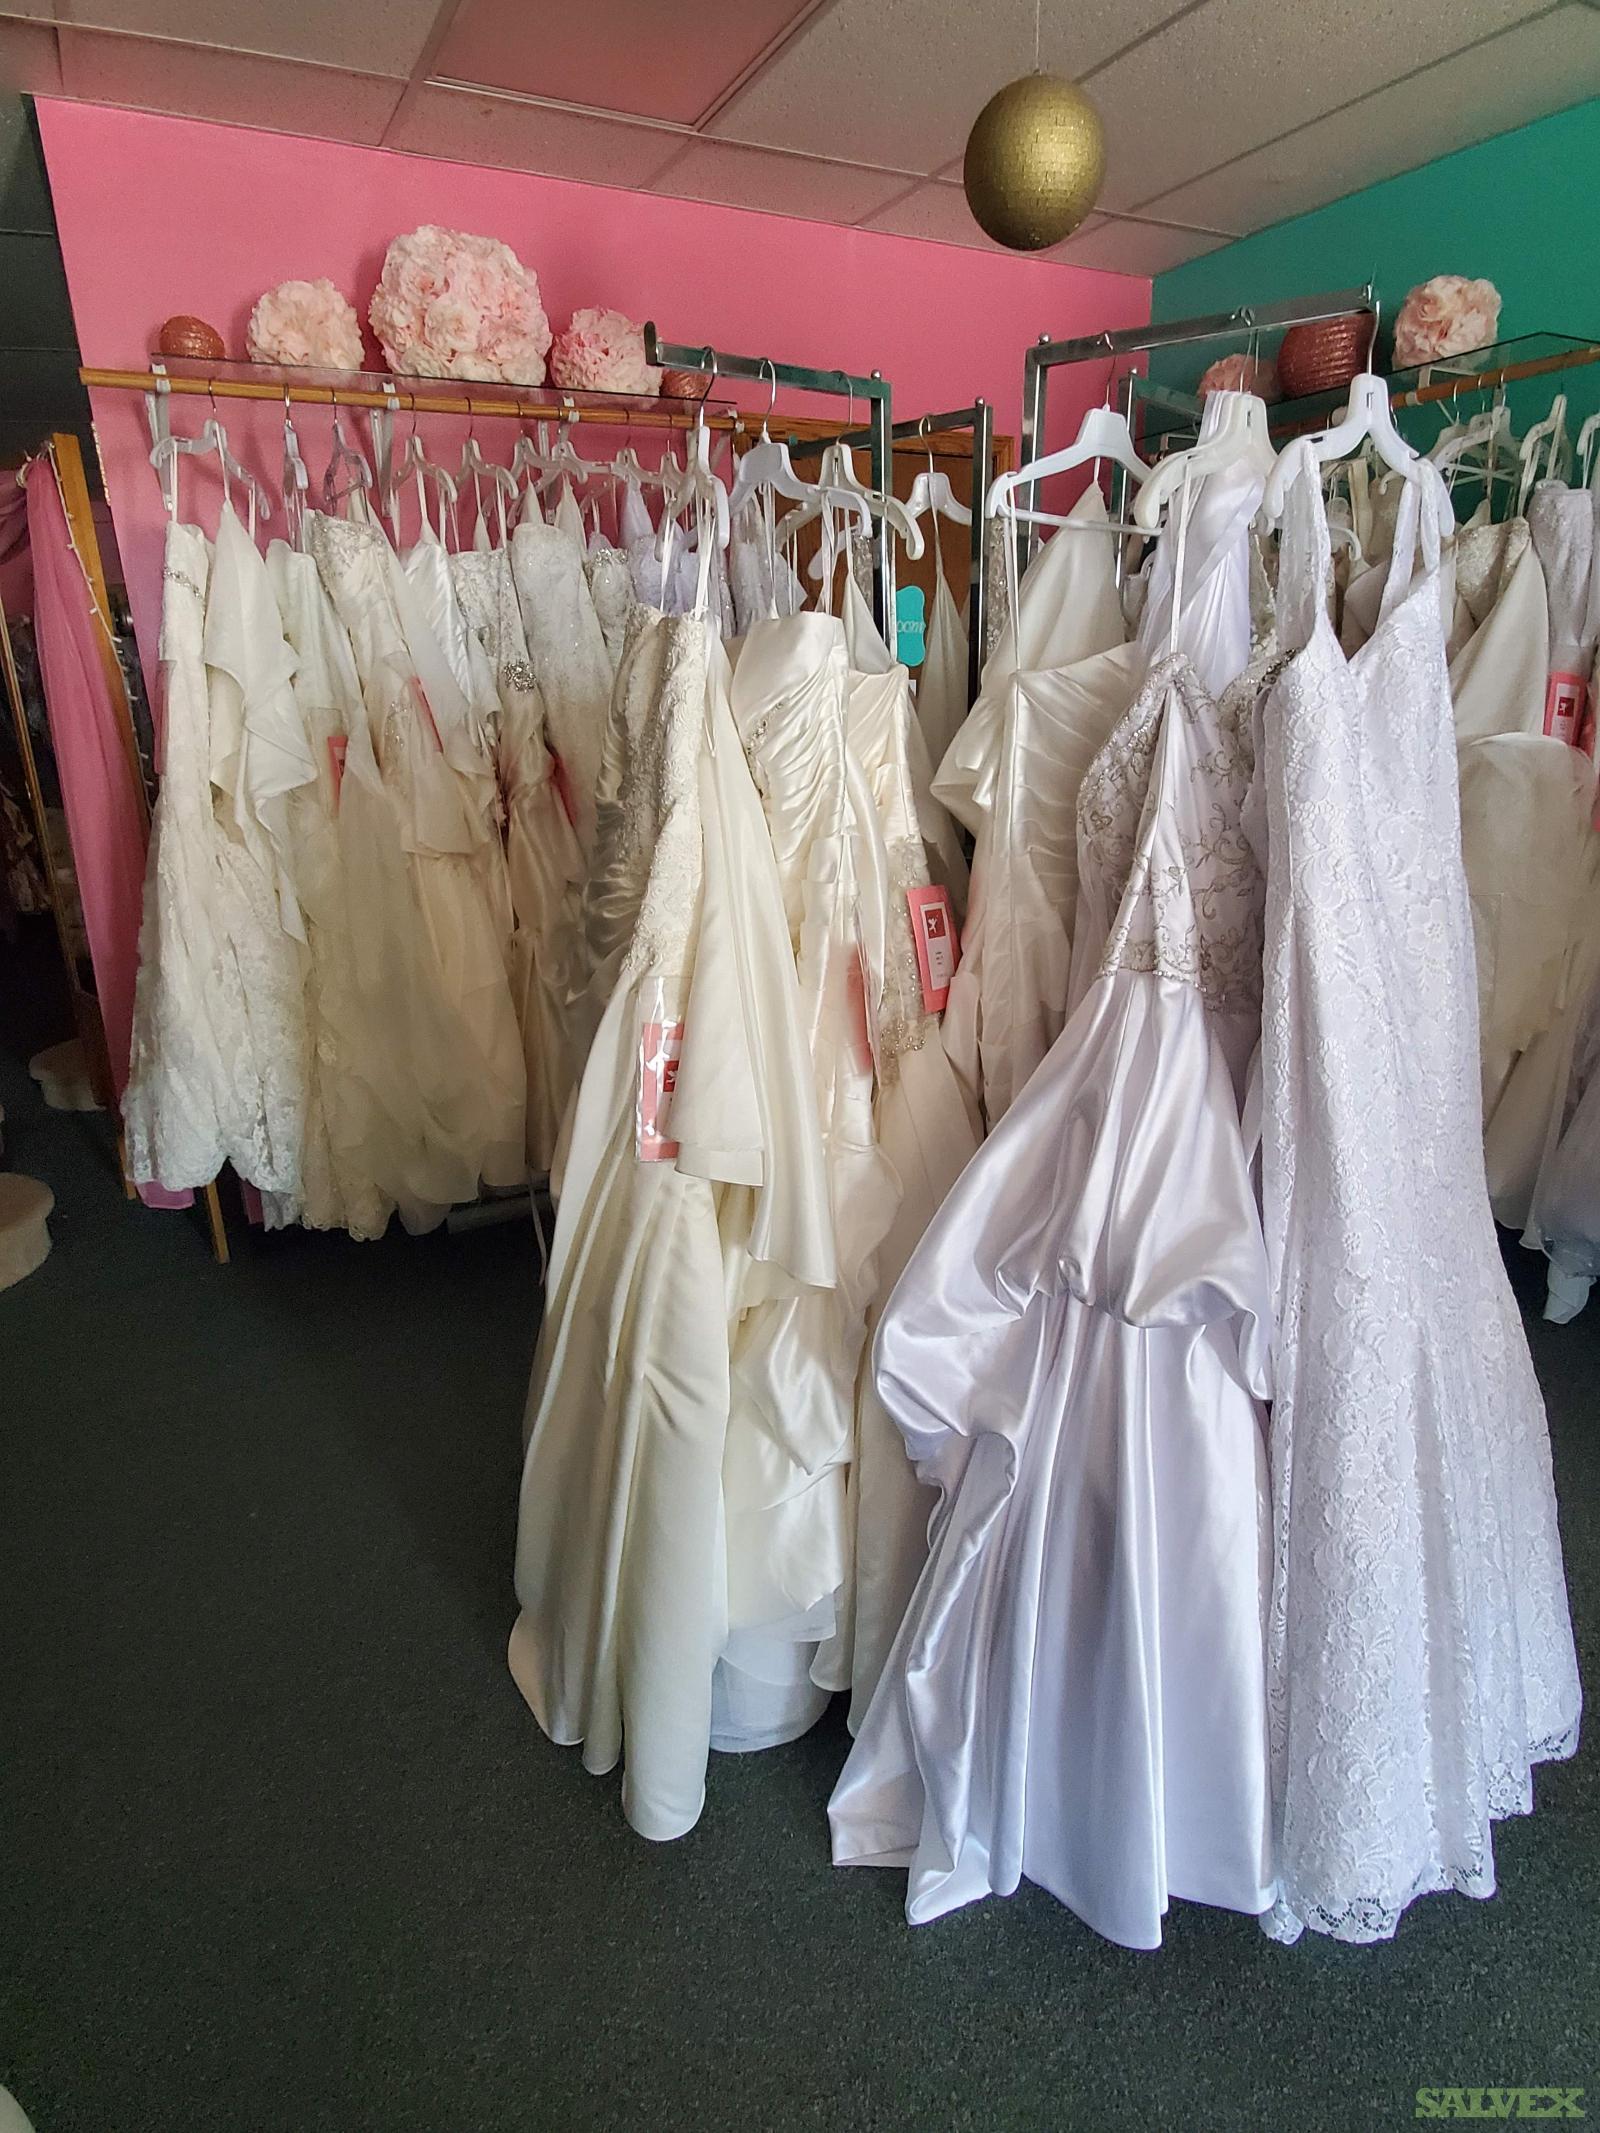 Bridal Gowns (20 Dresses)